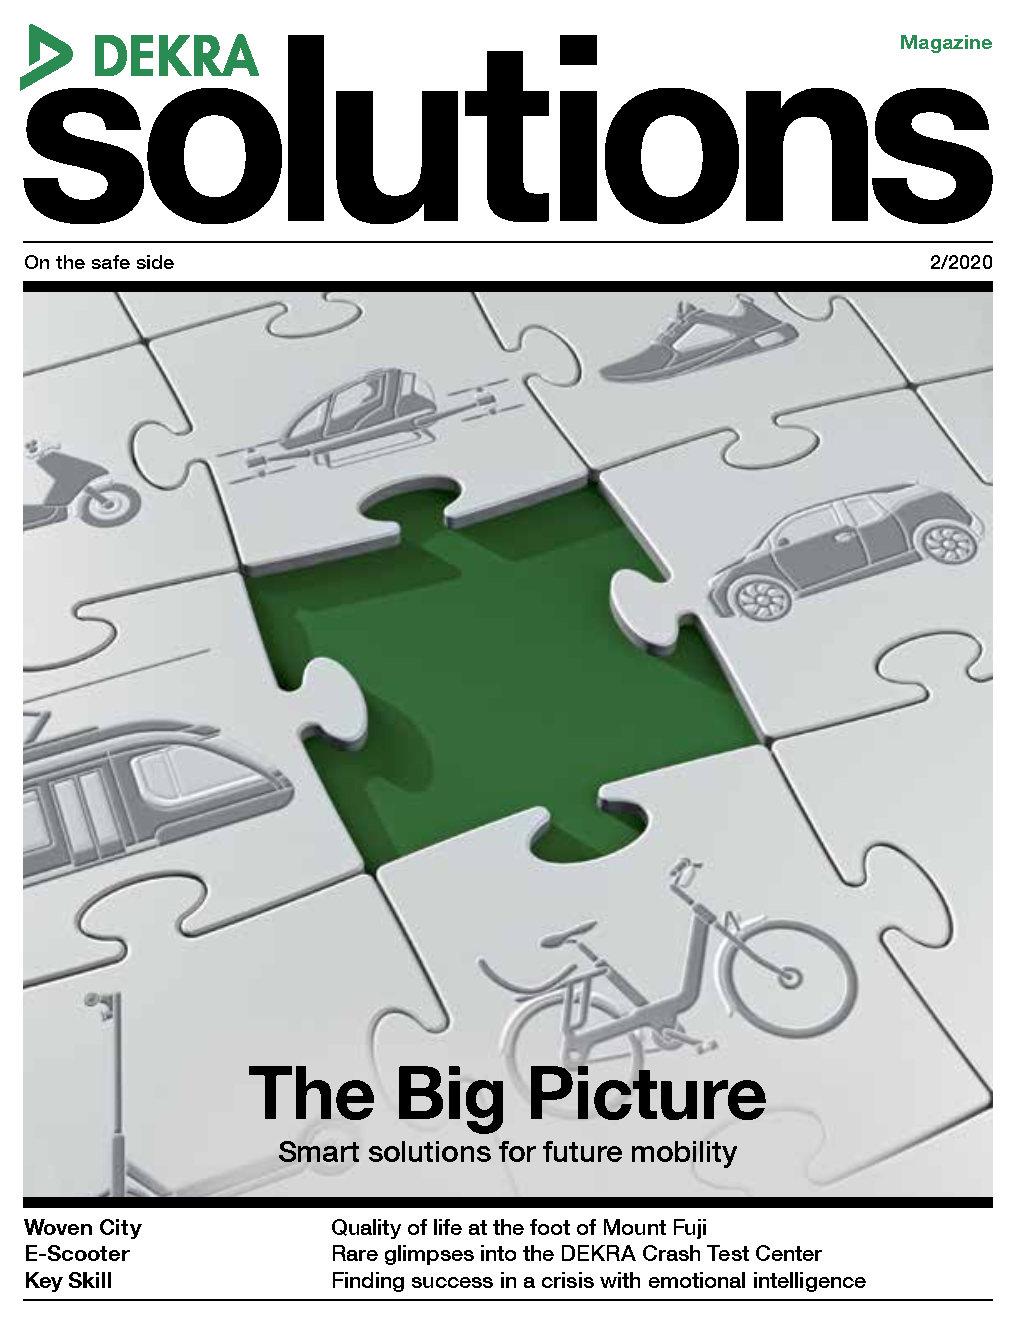 DEKRA solutions Magazine 2/2020